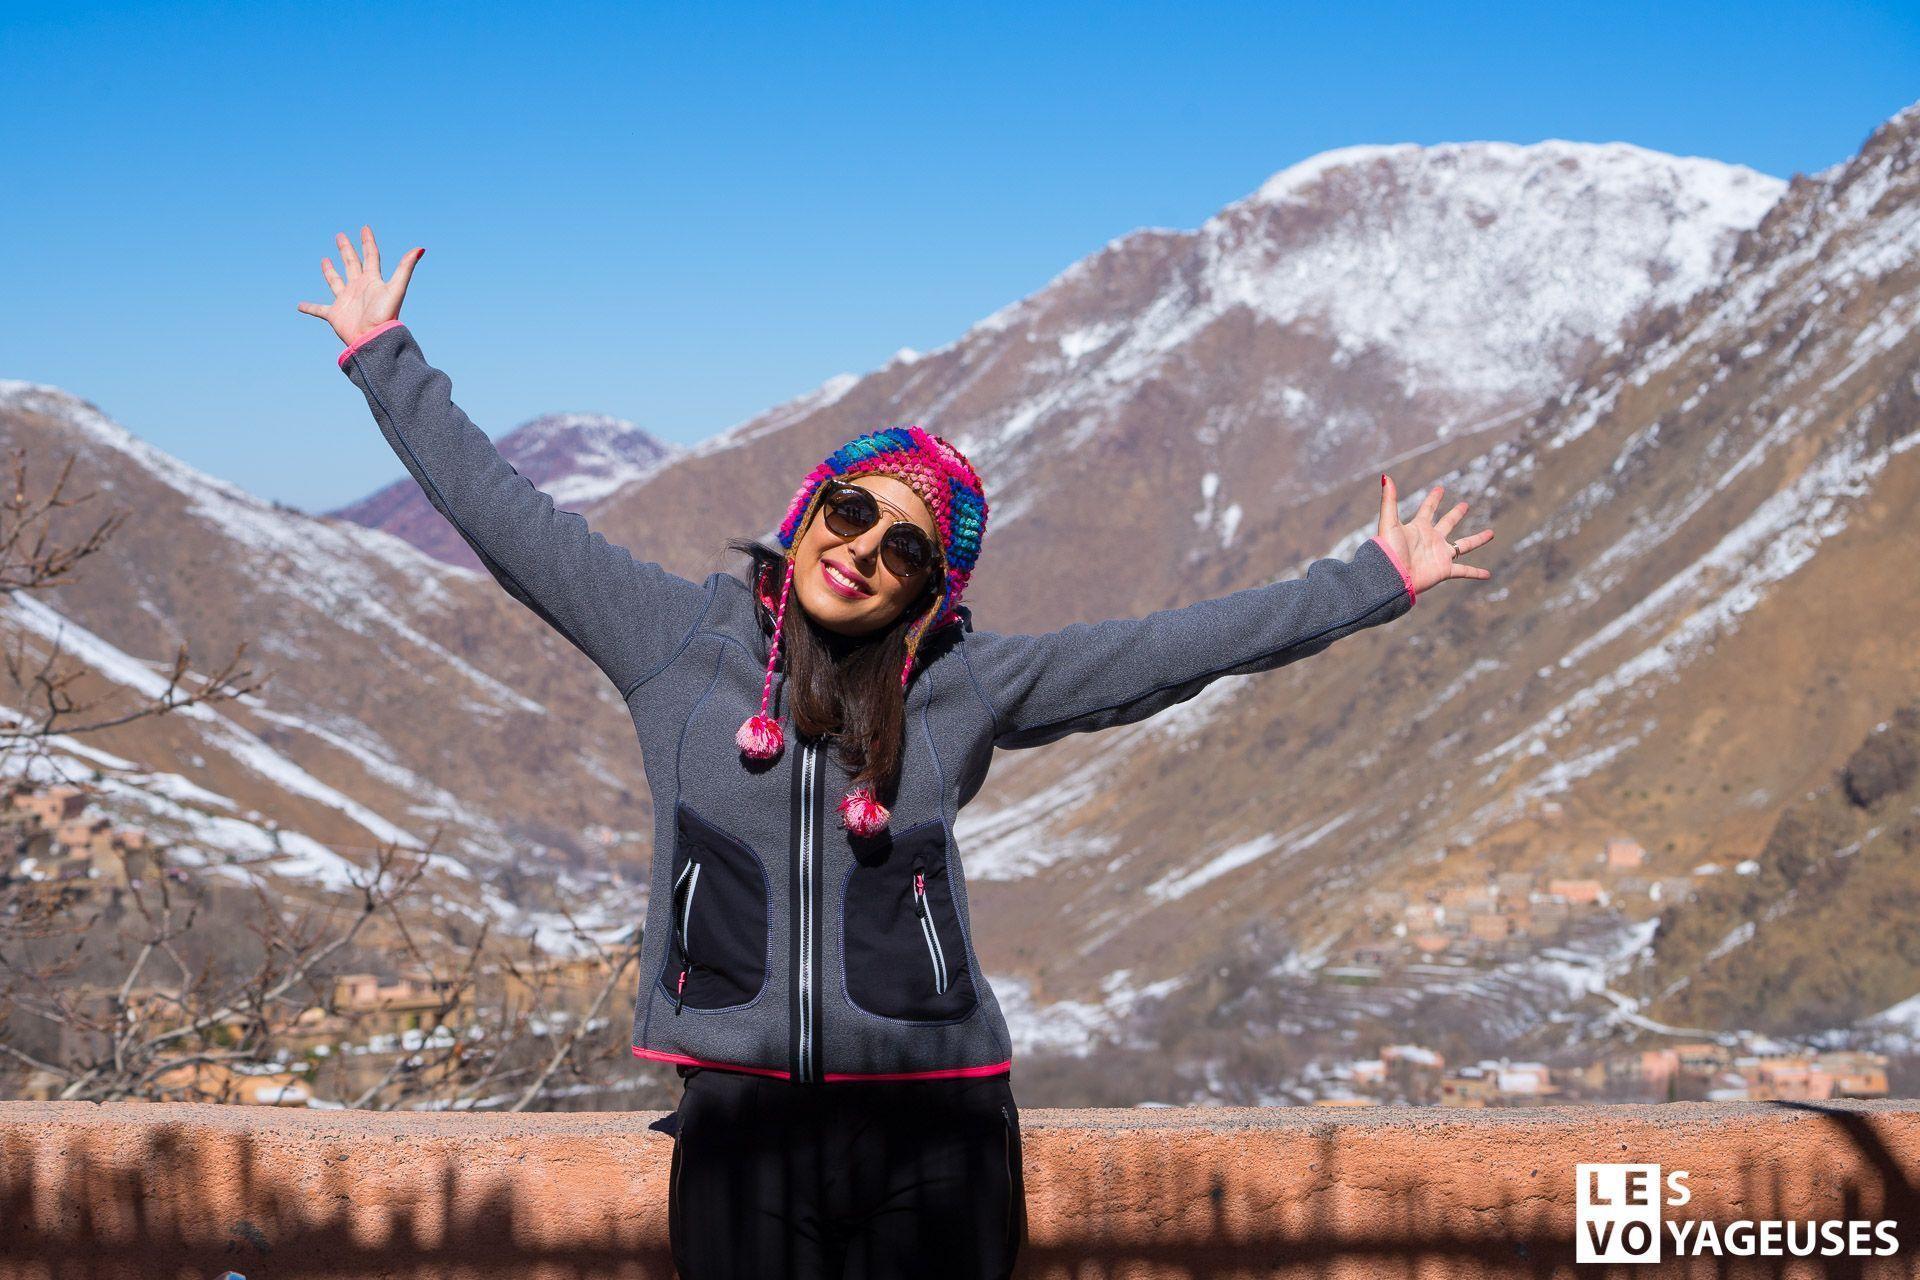 Les-voyageuses-maroc-imlil-hiver-09973